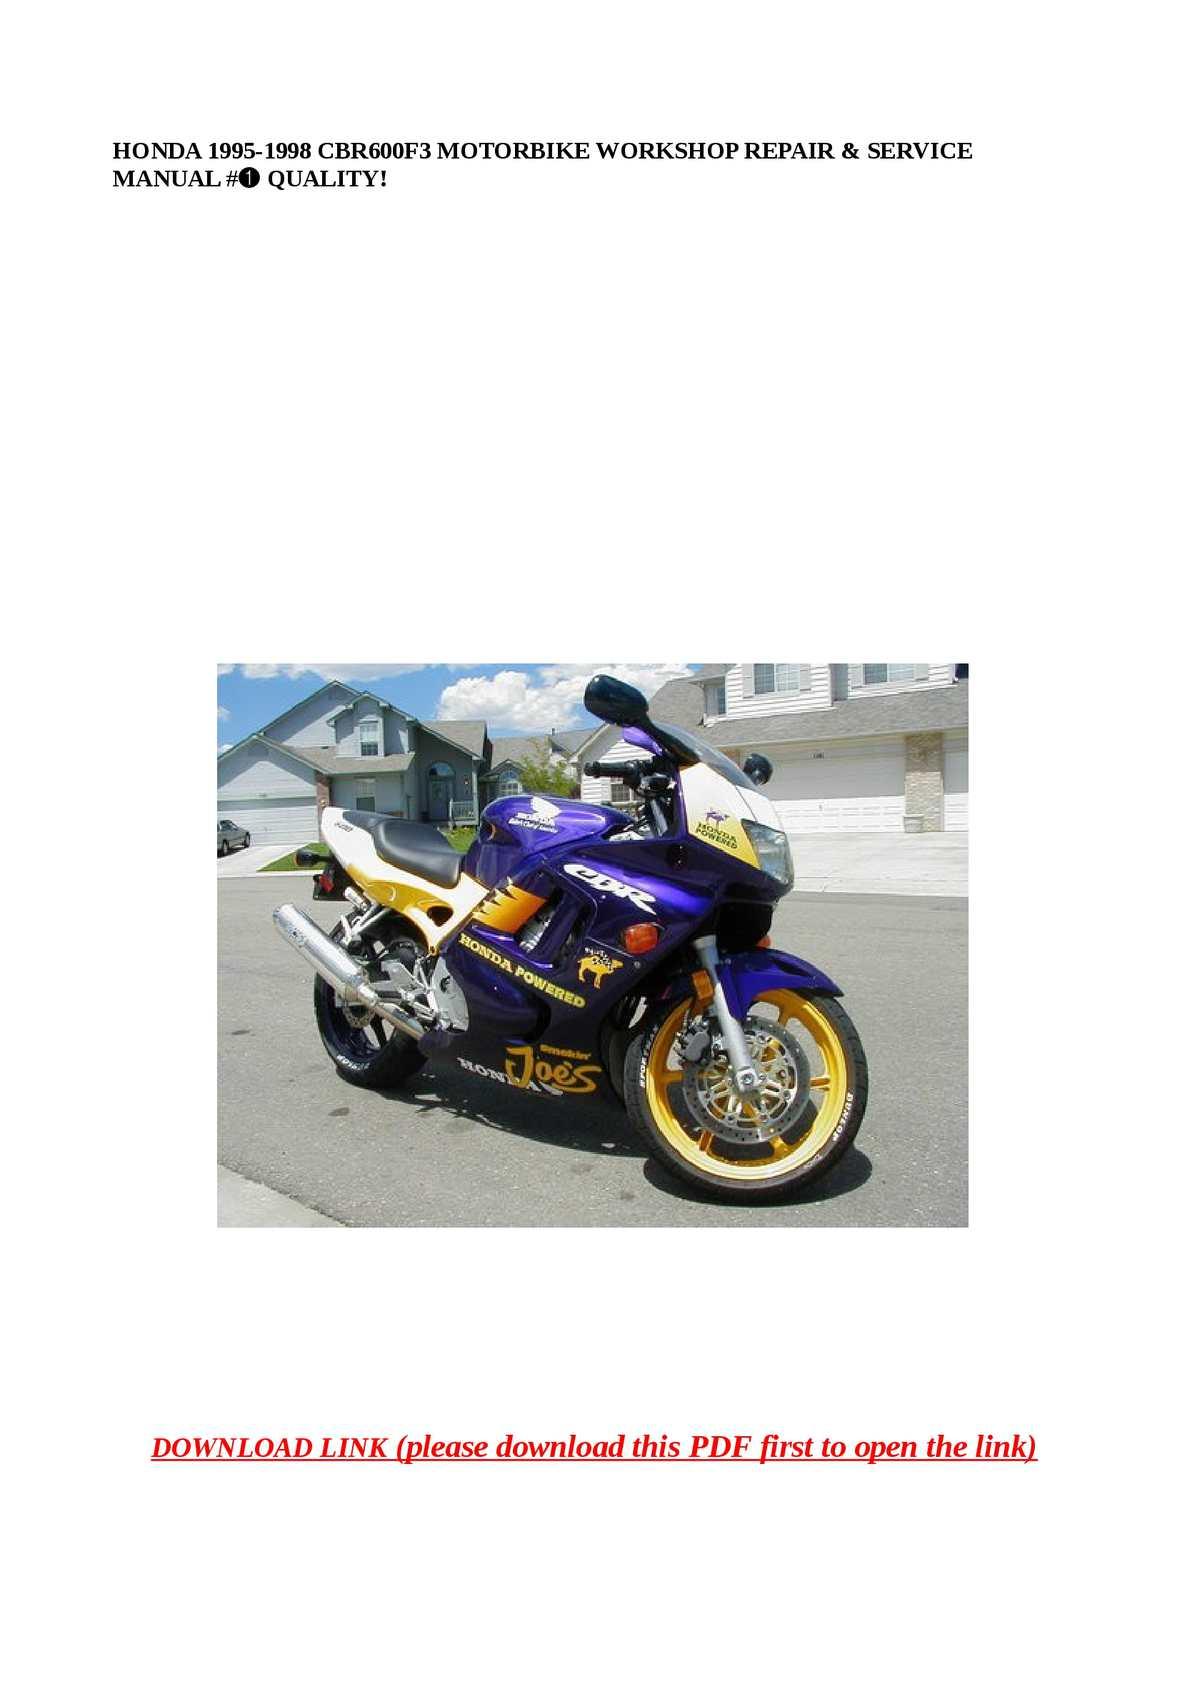 Calaméo - HONDA 1995-1998 CBR600F3 MOTORBIKE WORKSHOP REPAIR & SERVICE  MANUAL #➀ QUALITY!